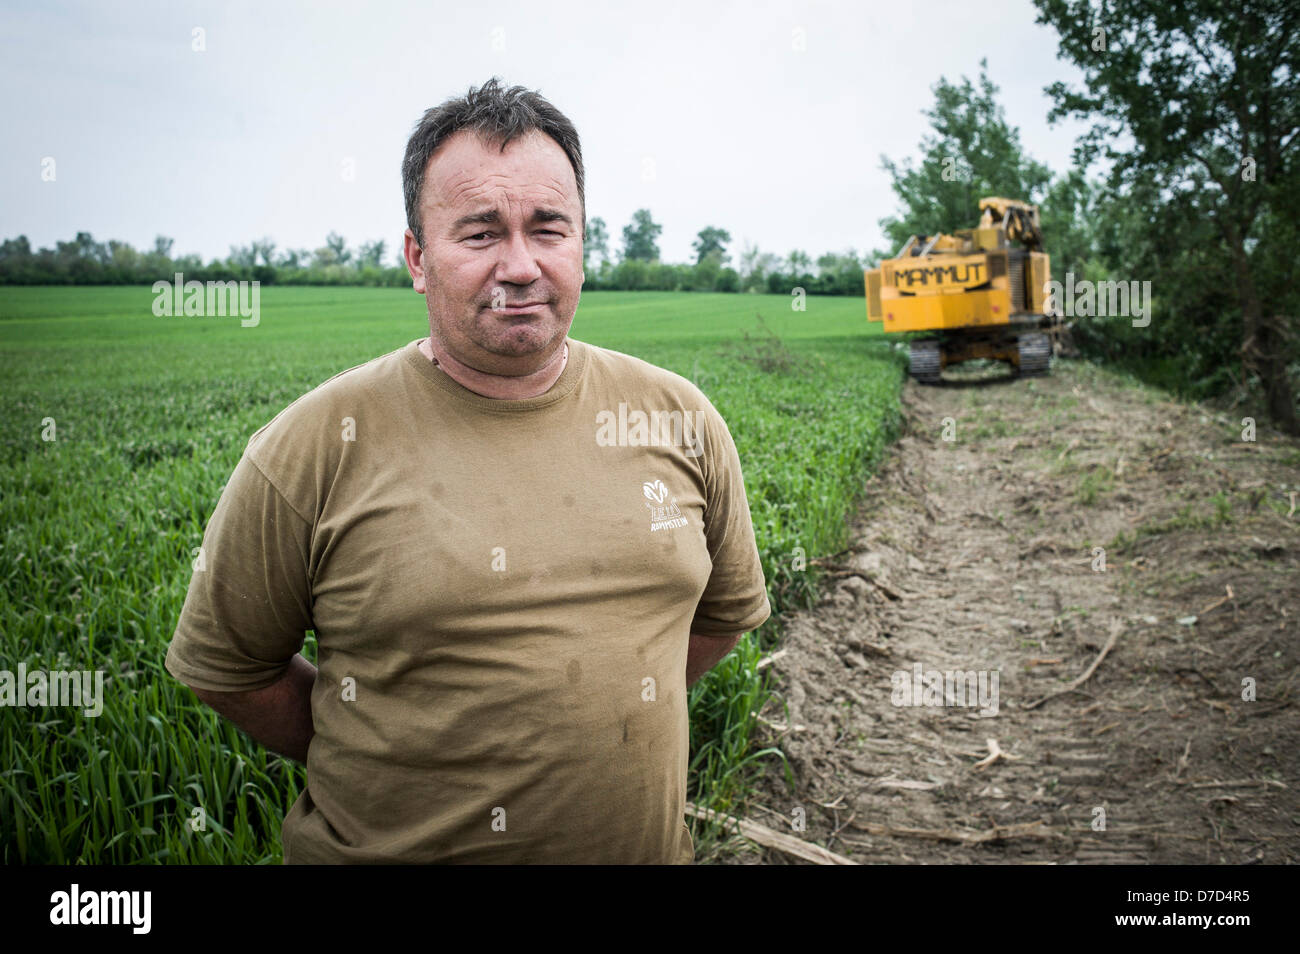 Anatoly Chubais apologized to drivers for his behavior 03.06.2011